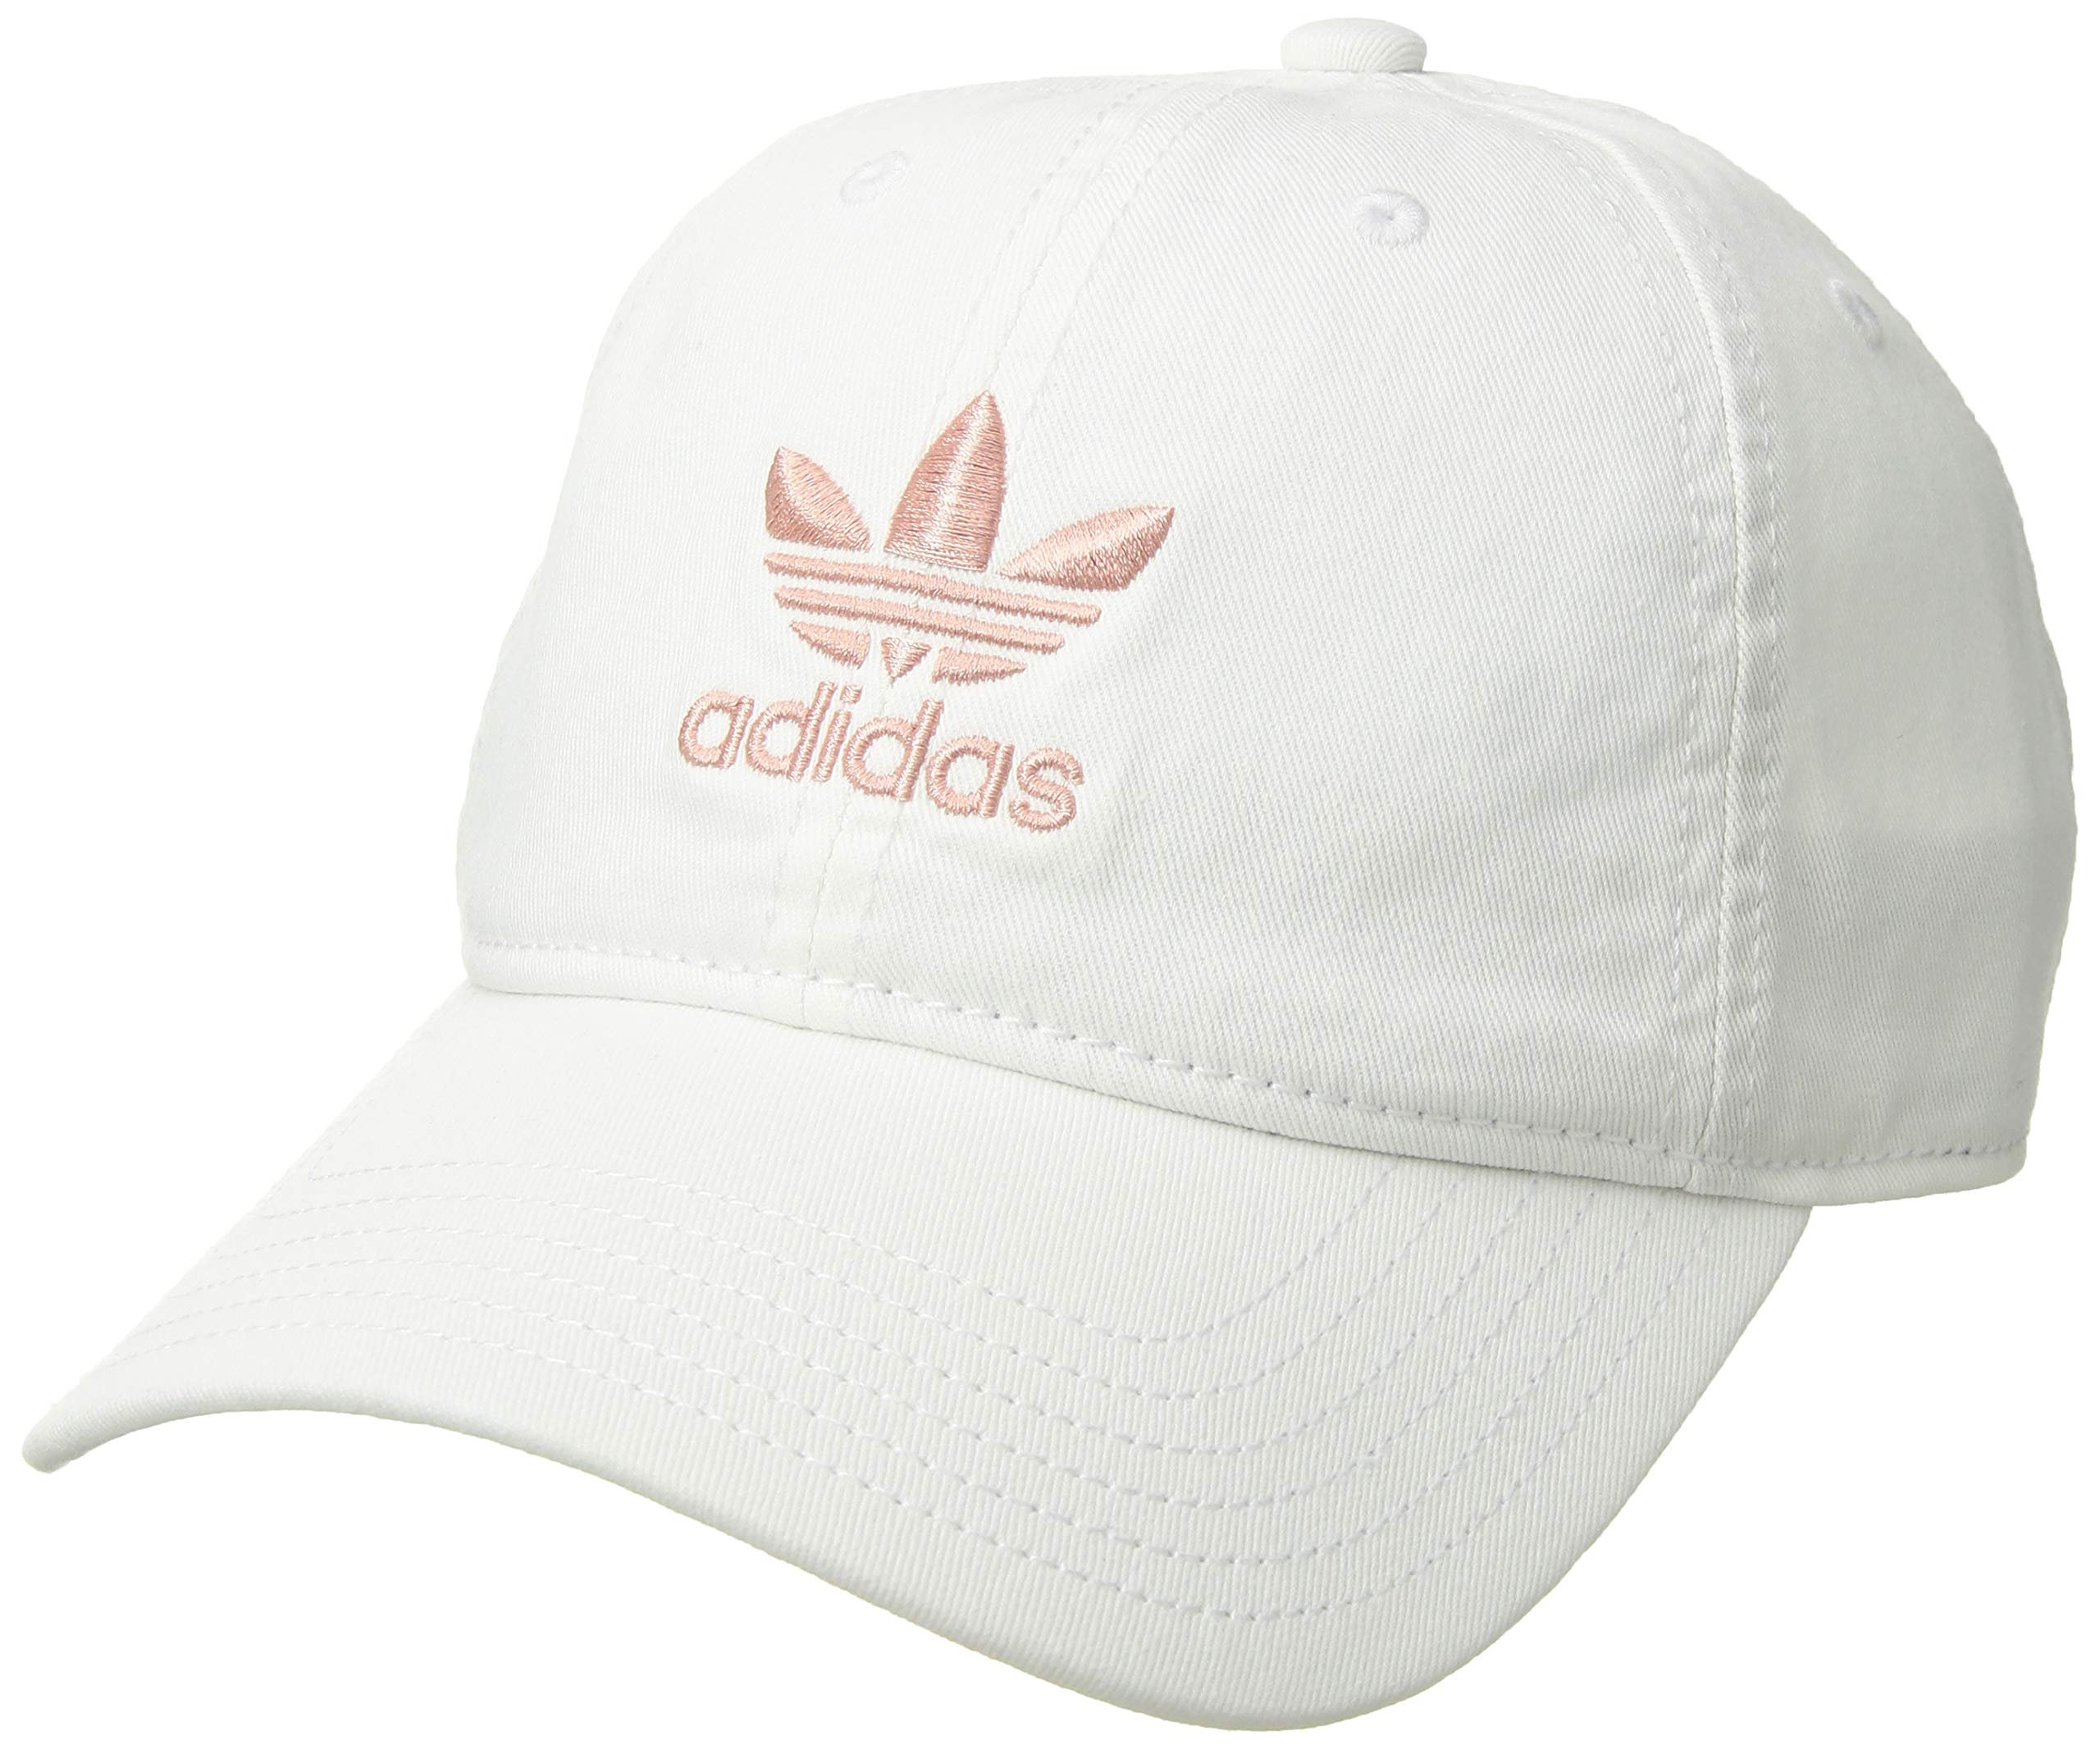 0693b2bbe4c Galleon - Adidas Women s Originals Relaxed Adjustable Strapback Cap ...